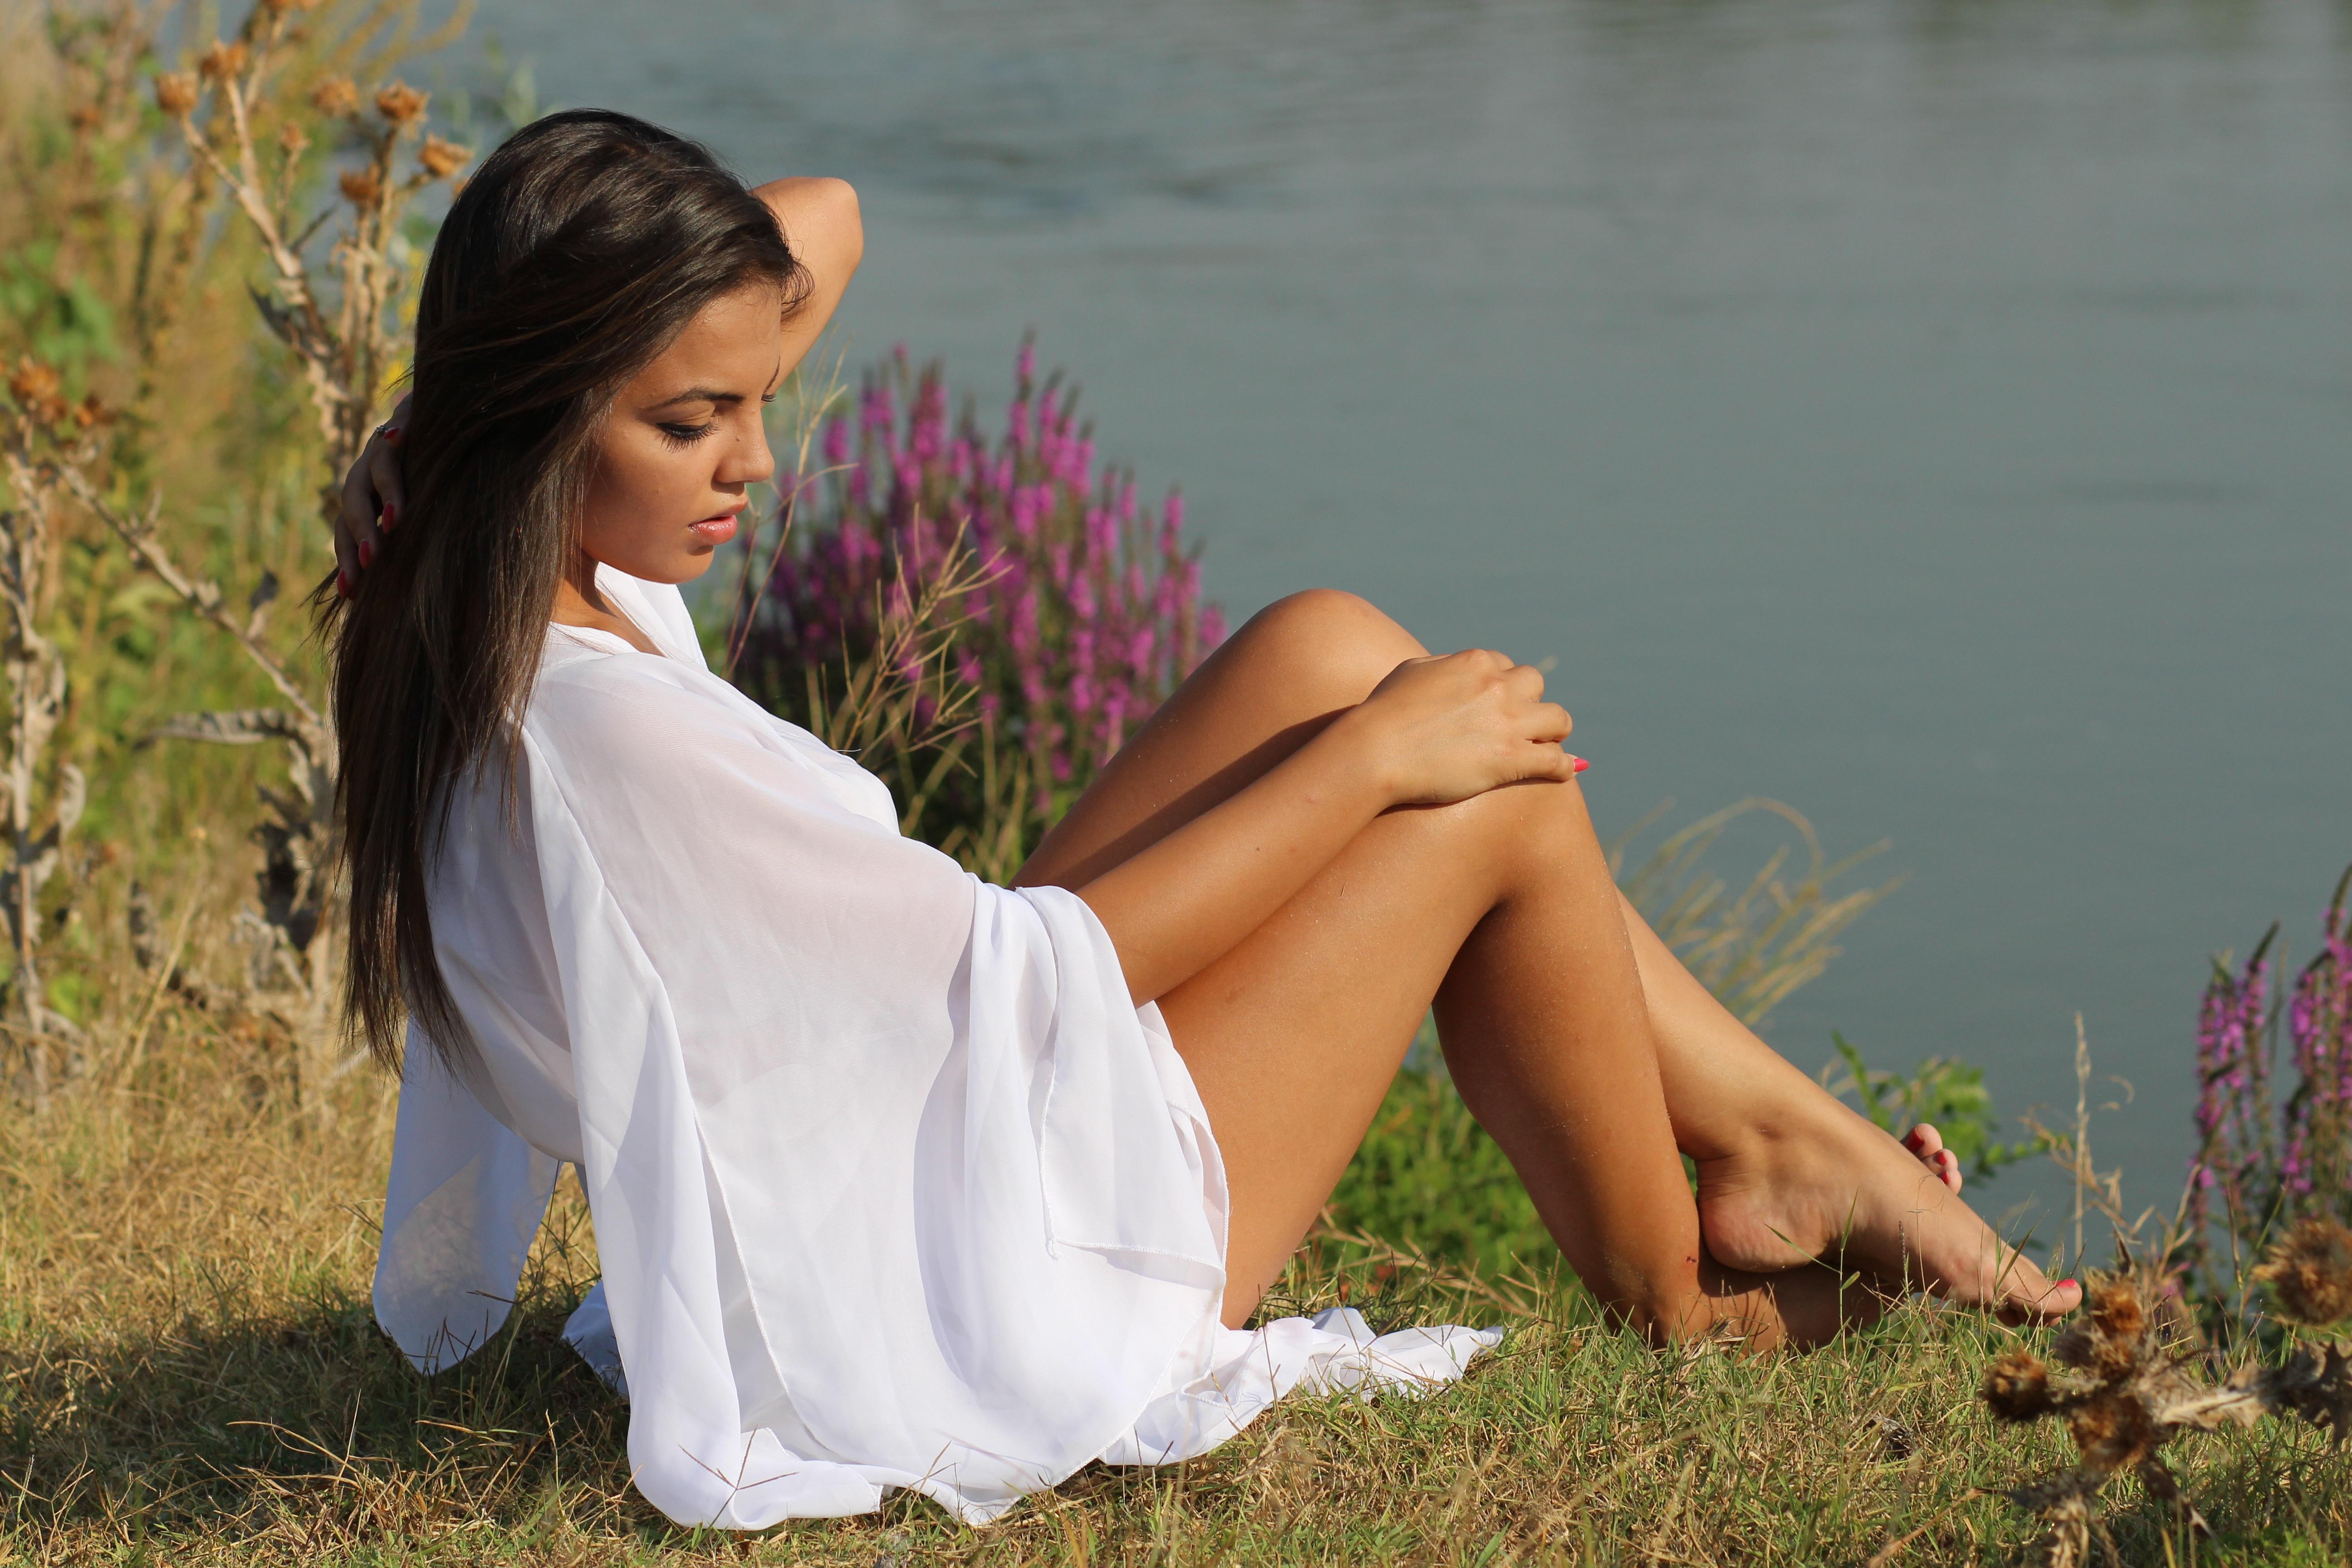 Fashion White Dress Girl